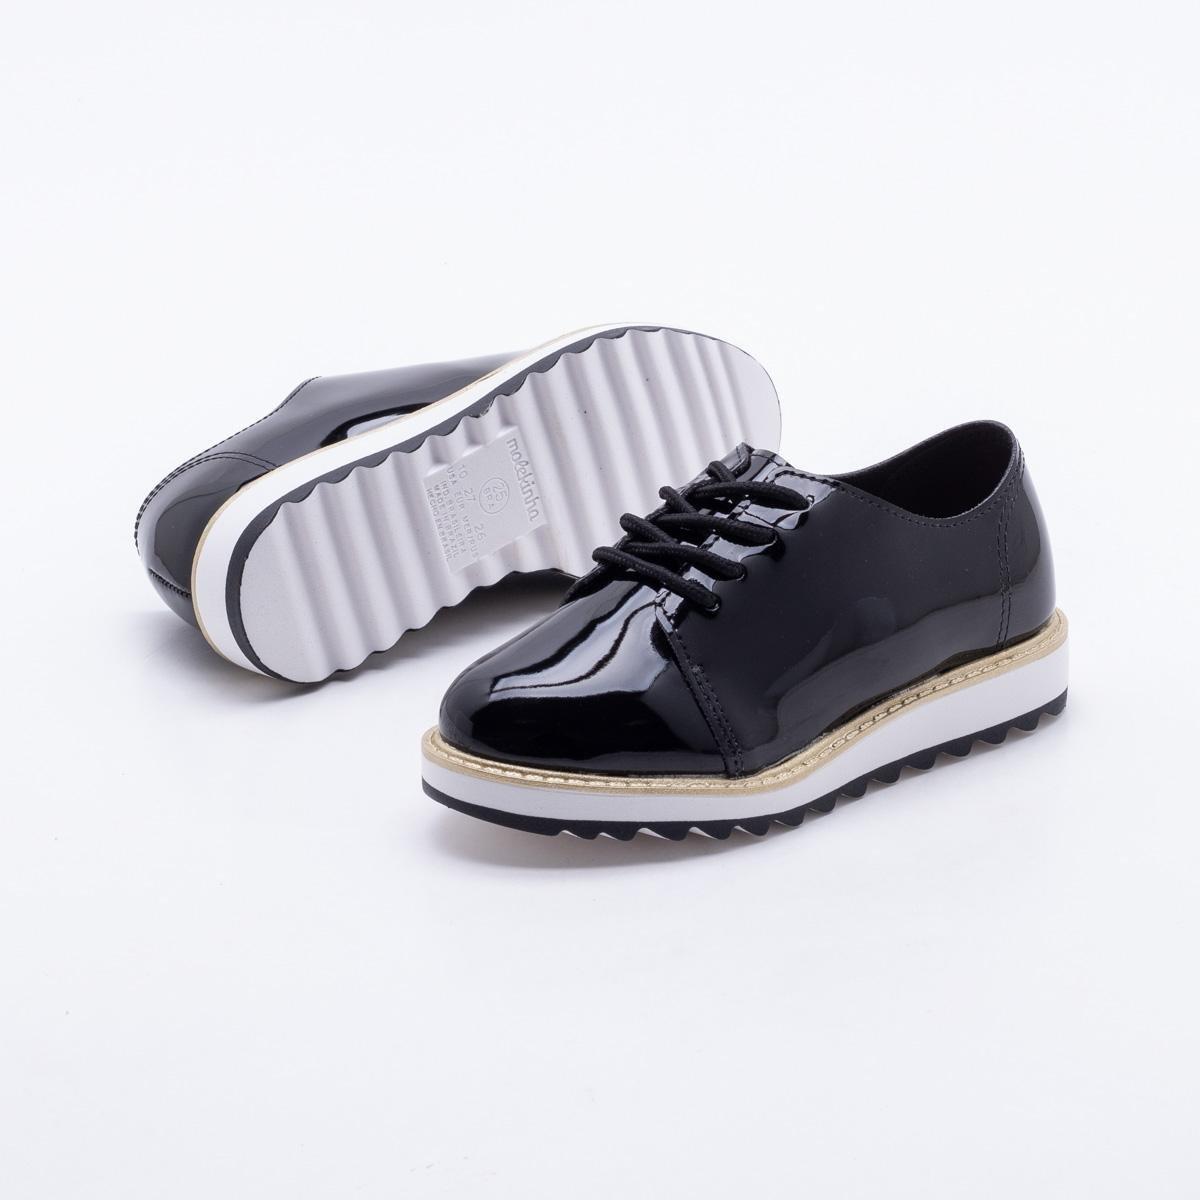 ceb5b68eb Sapato infantil oxford molekinha verniz feminino compre agora jpg 1200x1200  Sapato infantil oxford molekinha verniz preto